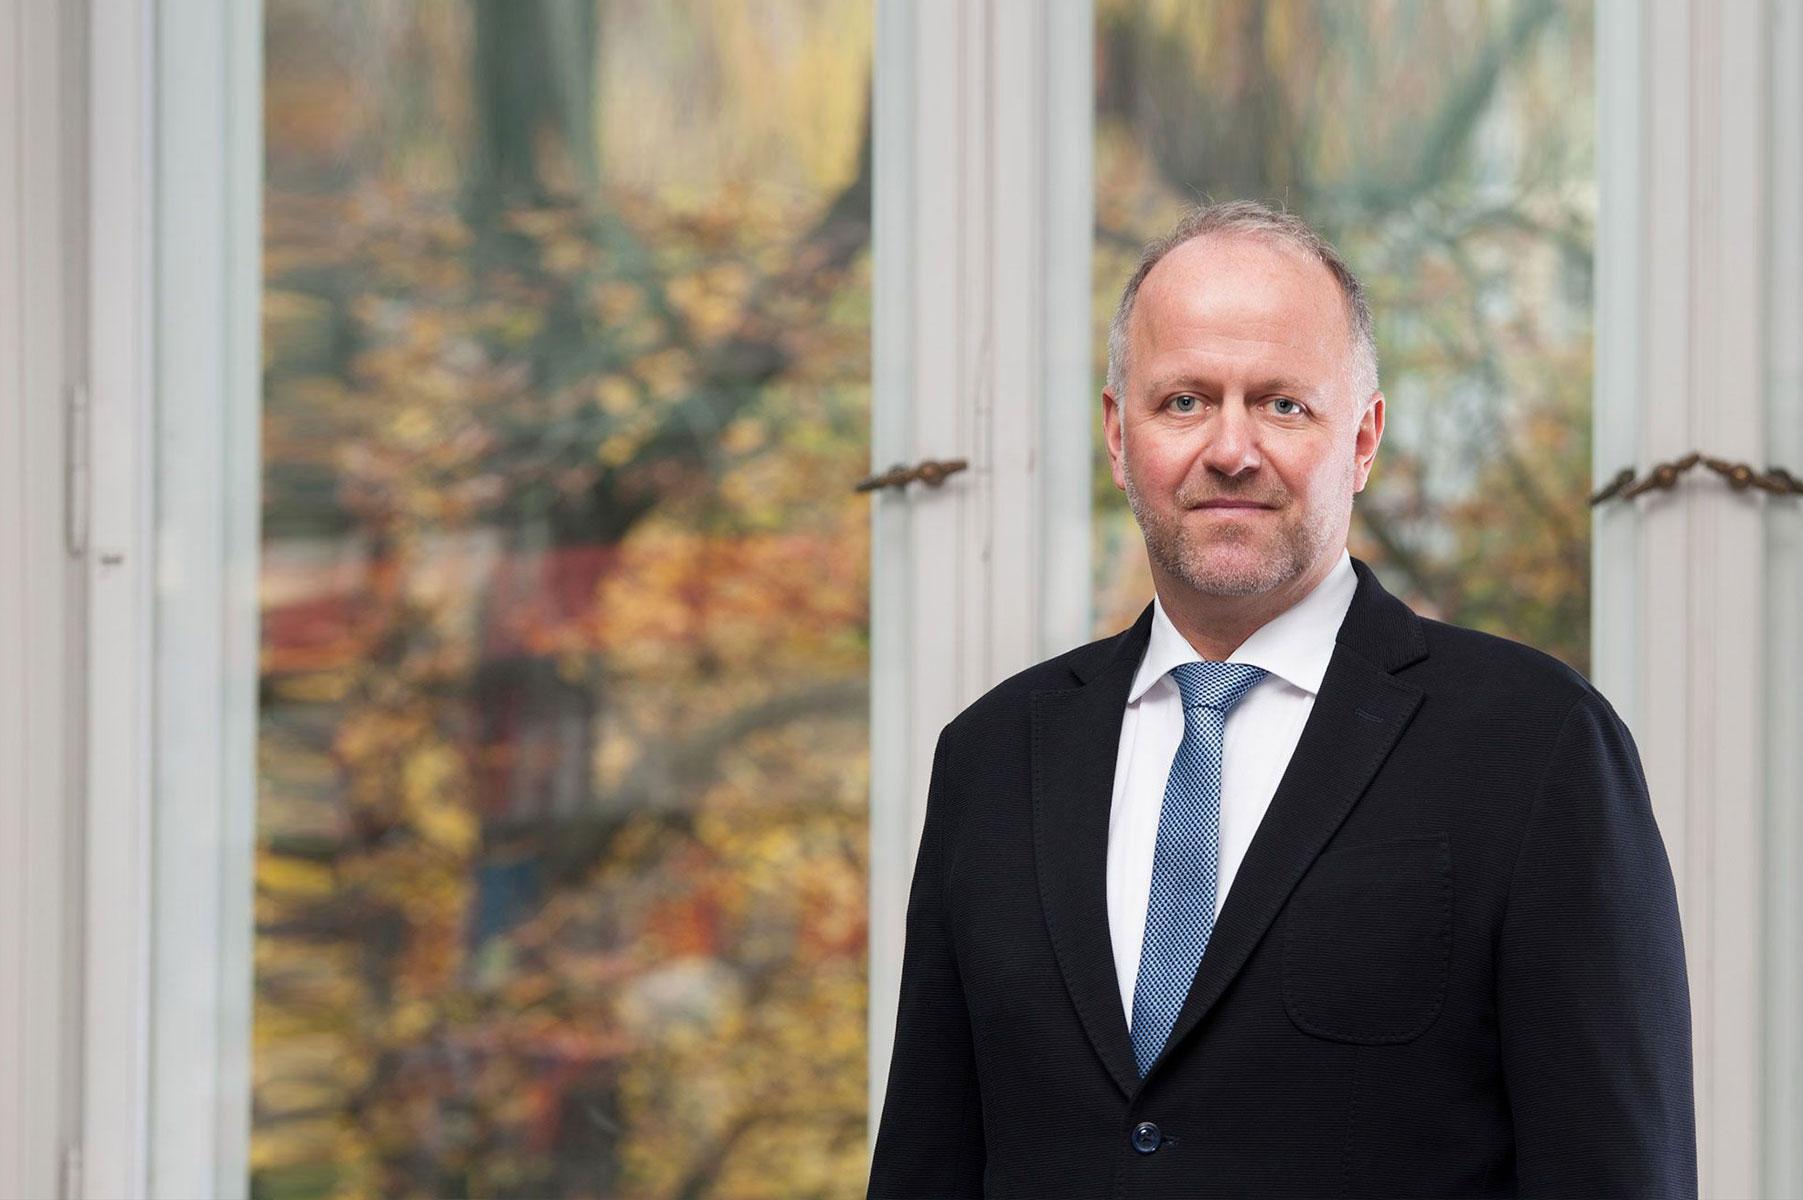 Notar Matthias Gerbeit